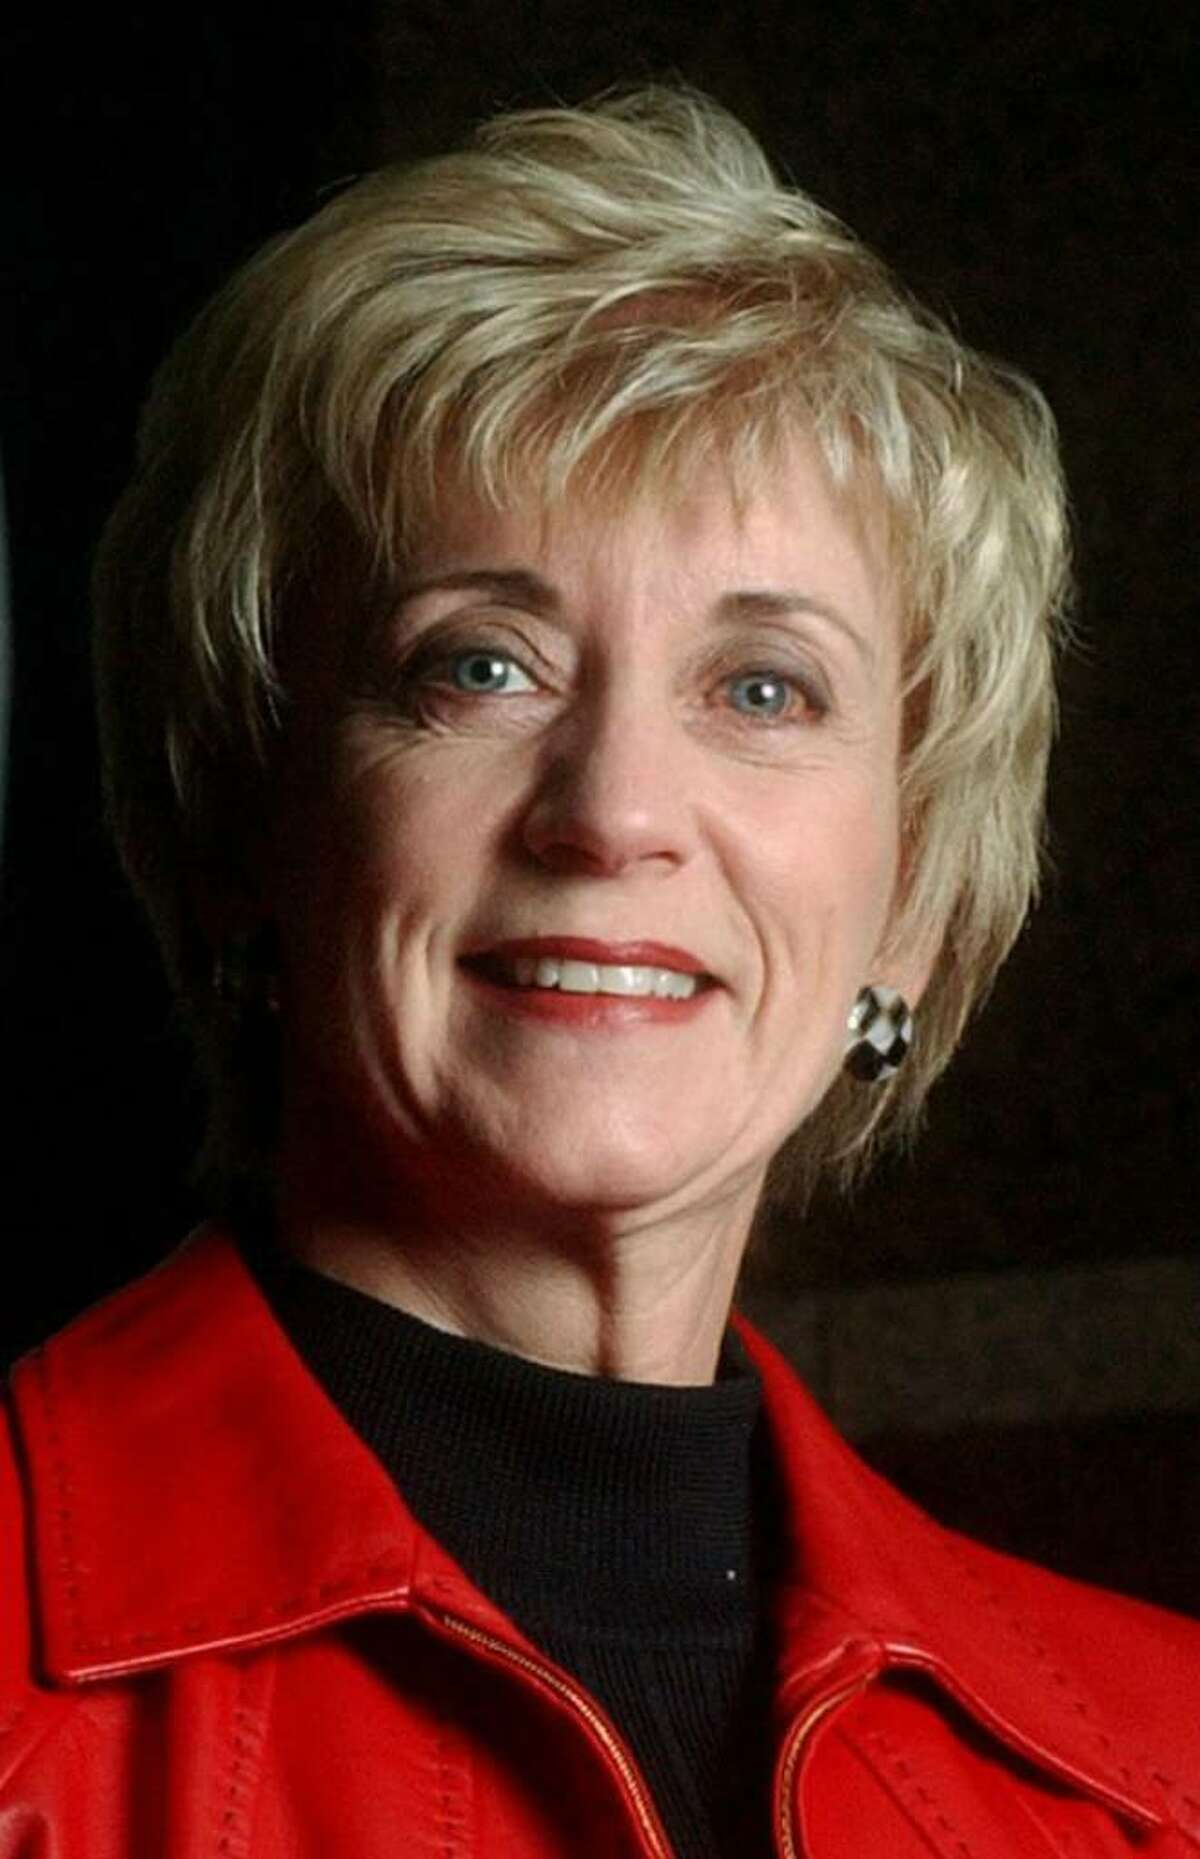 Linda McMahon, headshot from December 16, 2003